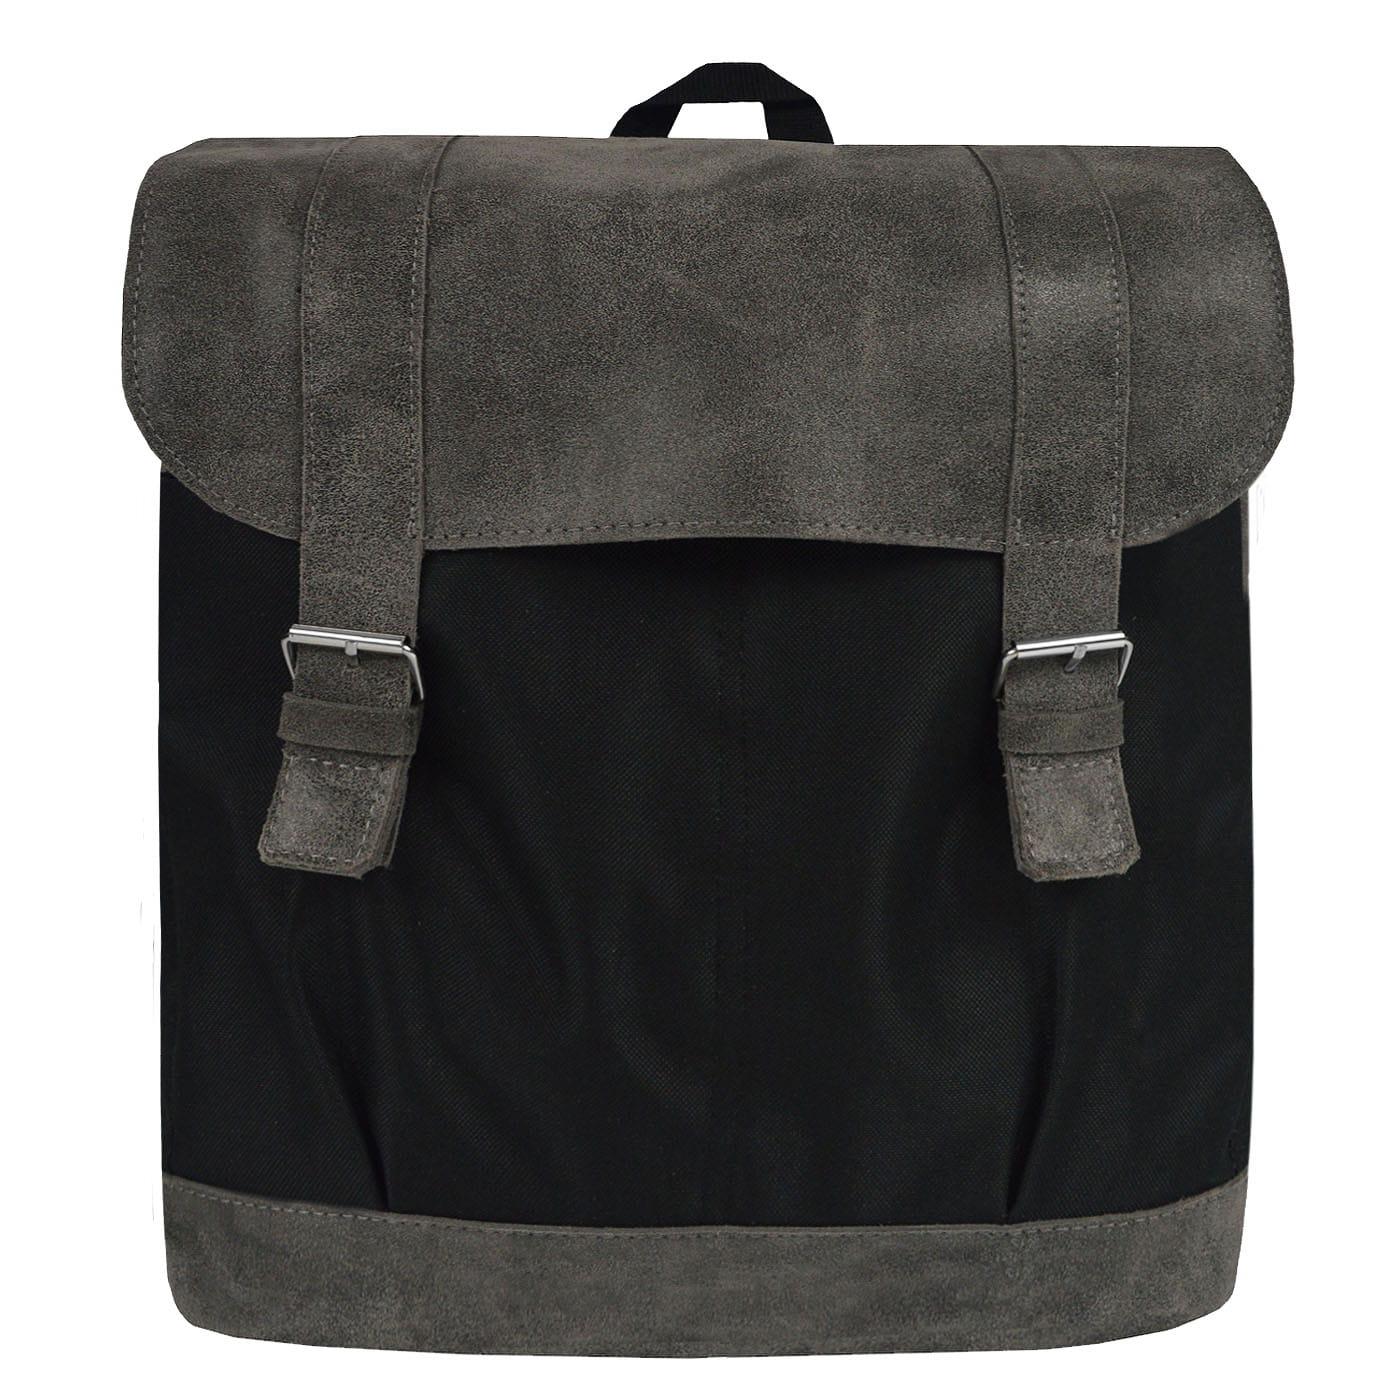 Duży Plecak Skórzany TSM18 - mieści laptopa